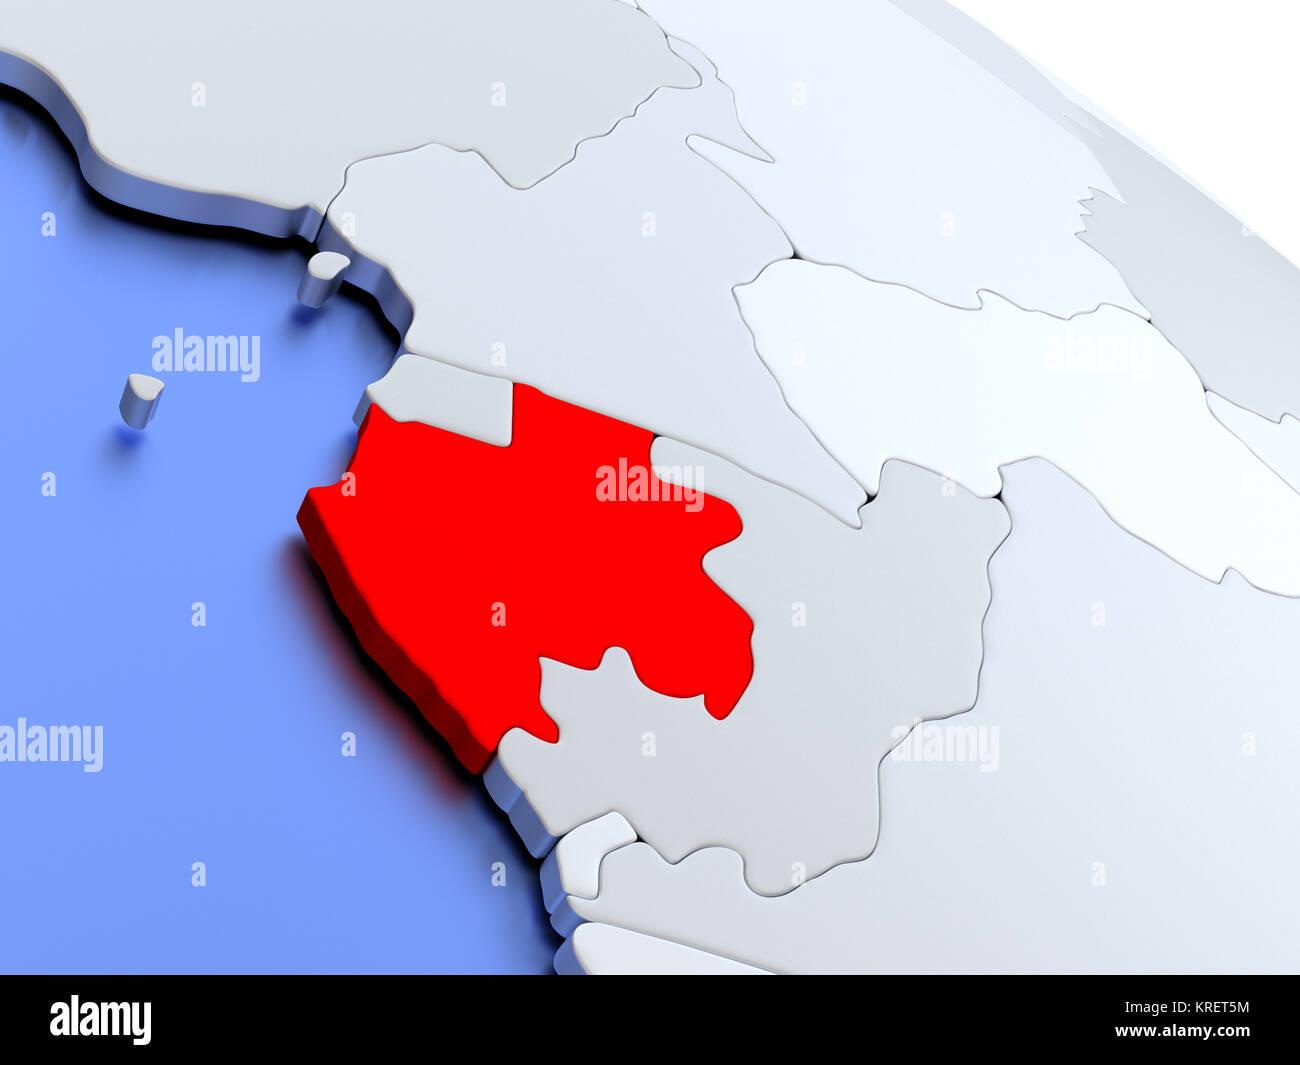 Gabon World Map.Gabon On World Map Stock Photo 169356704 Alamy